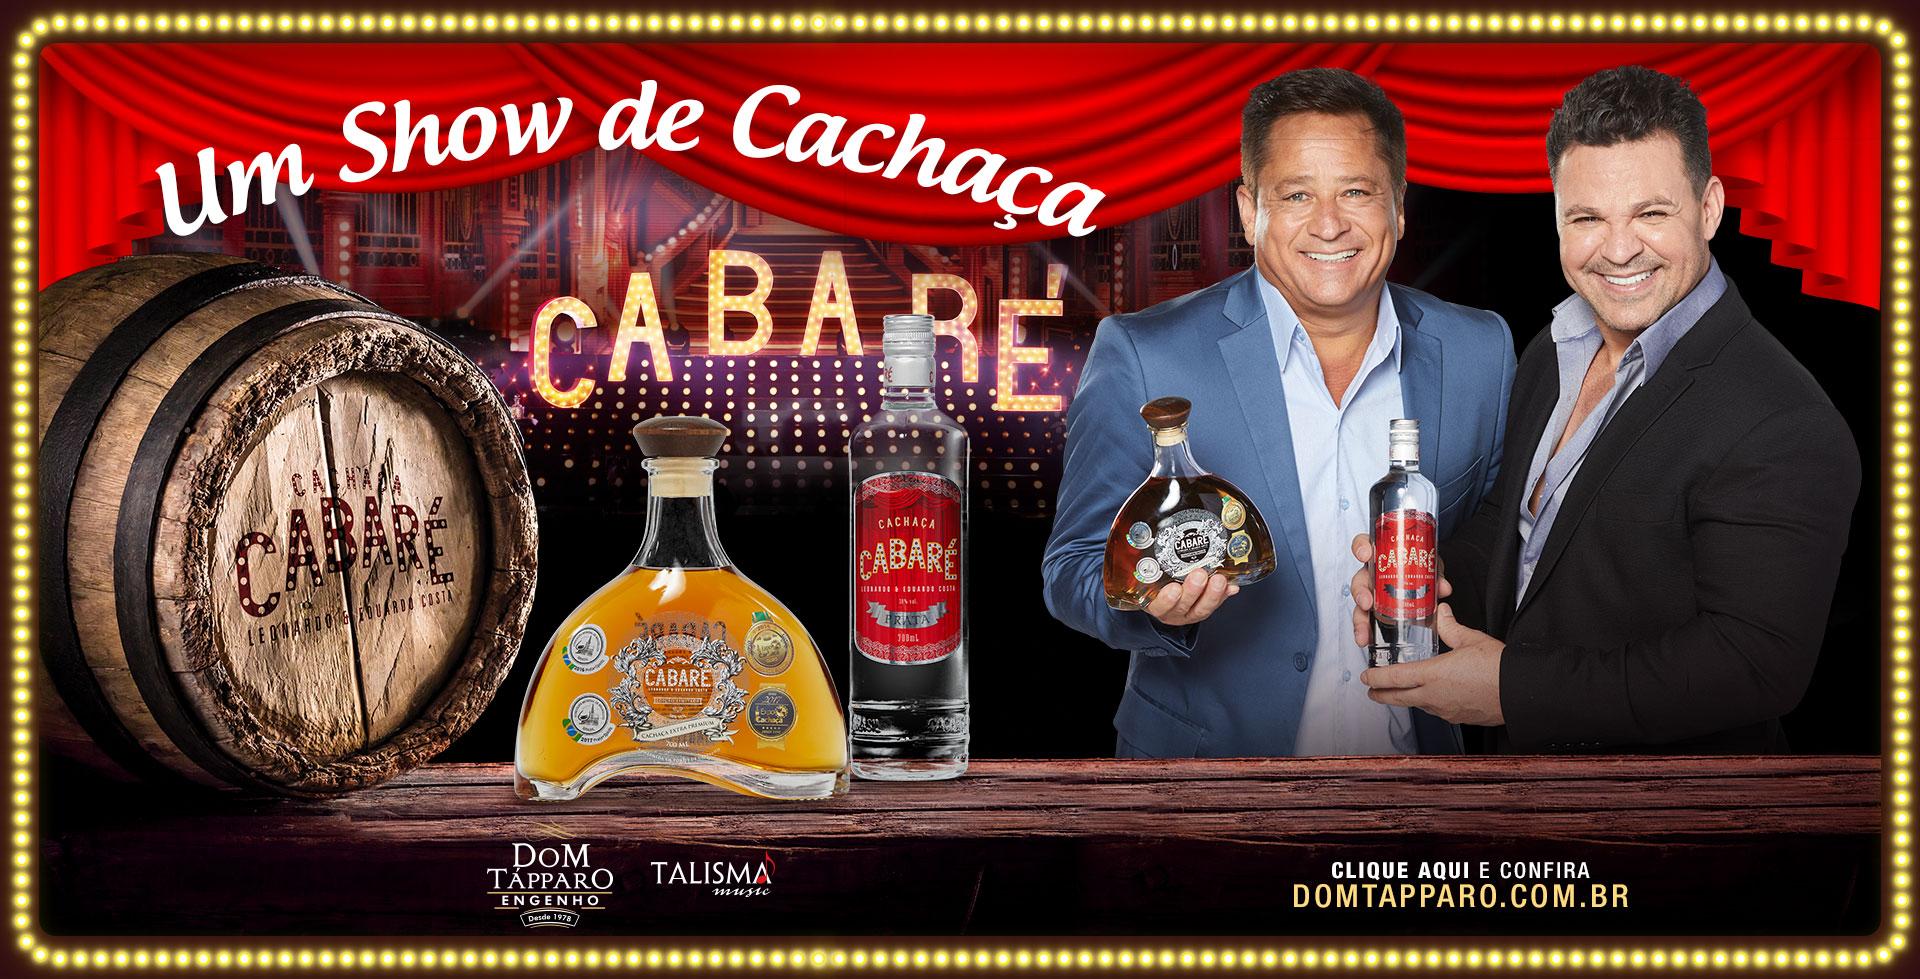 TopSiteLEO_Cachaca